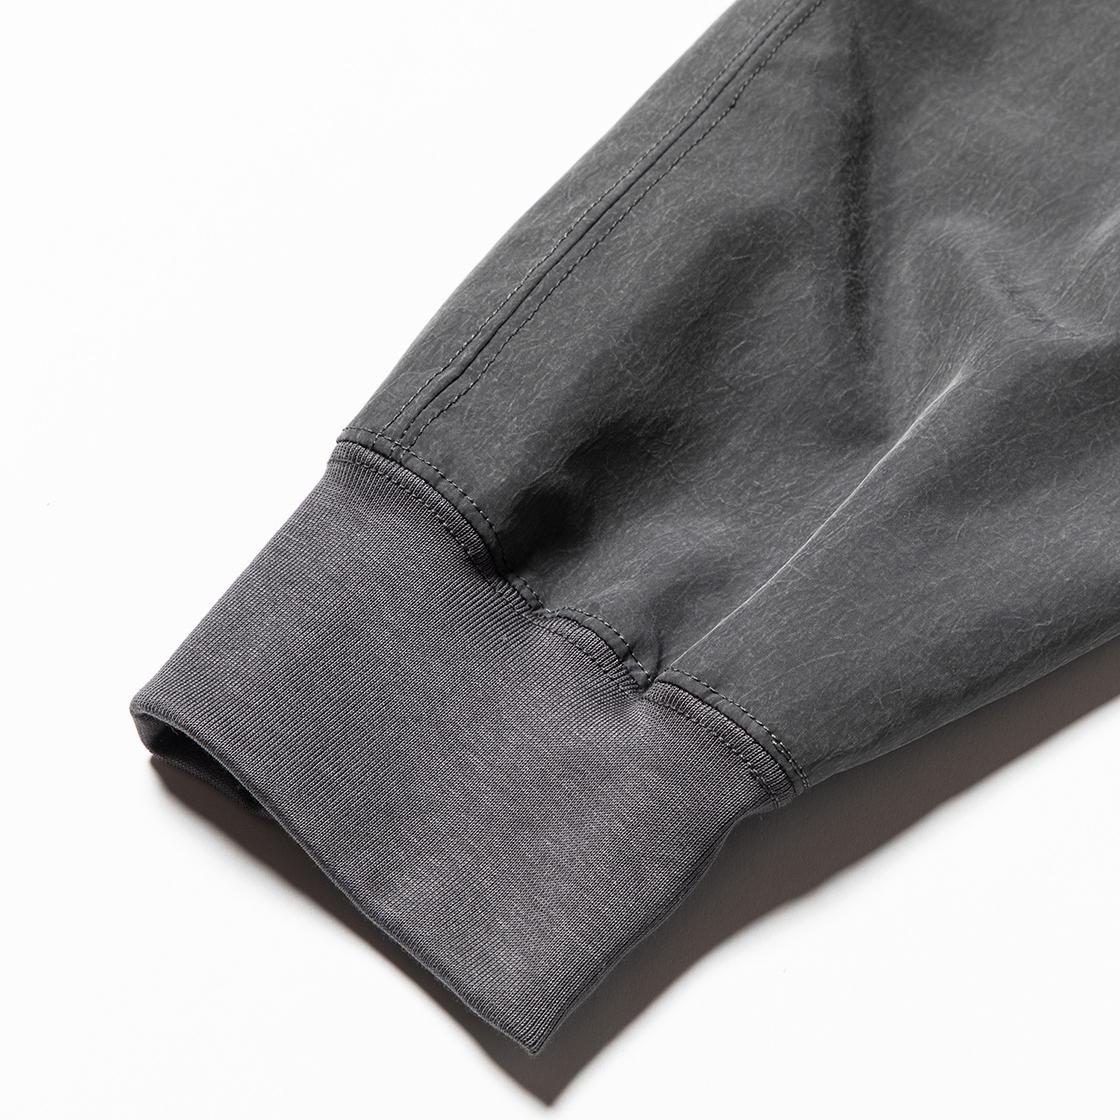 Nylon Popper SH Charcoal